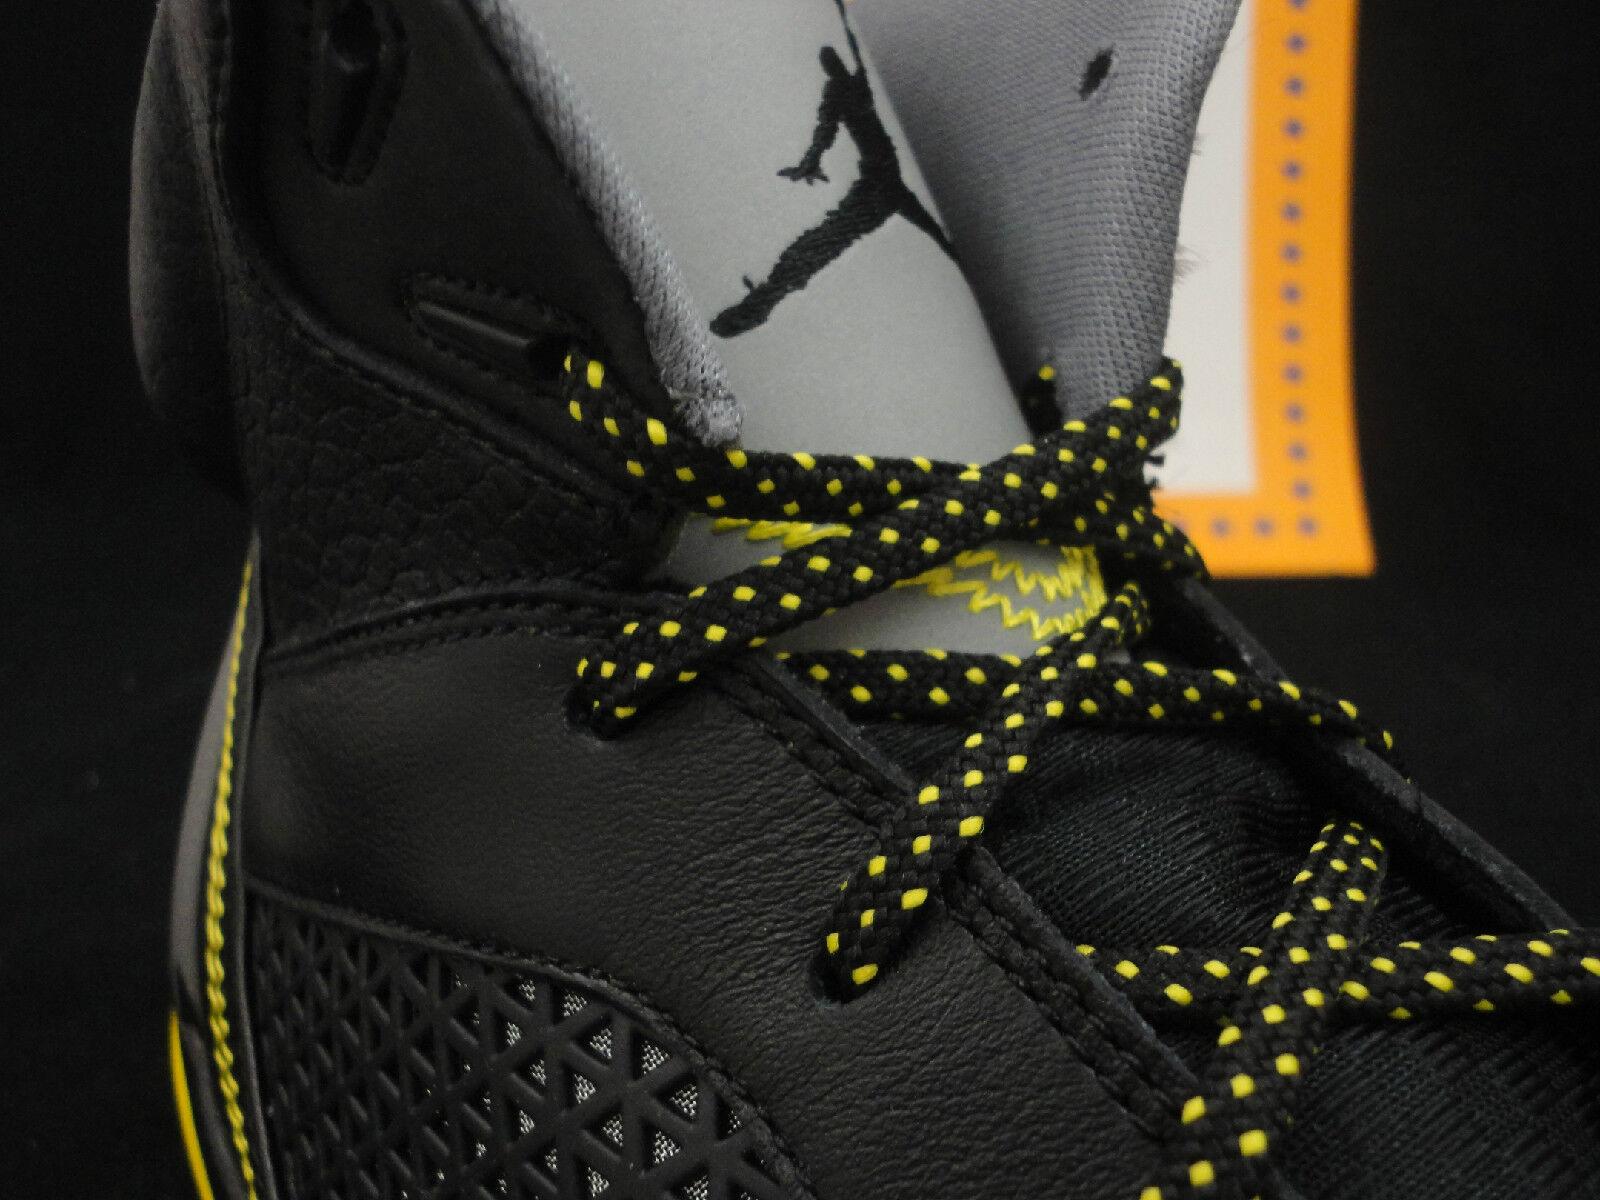 Nike Air Jordan Flight Remix, Black / Retail Vibrant Yellow, Retail / $160, Size 10.5 bb39d0